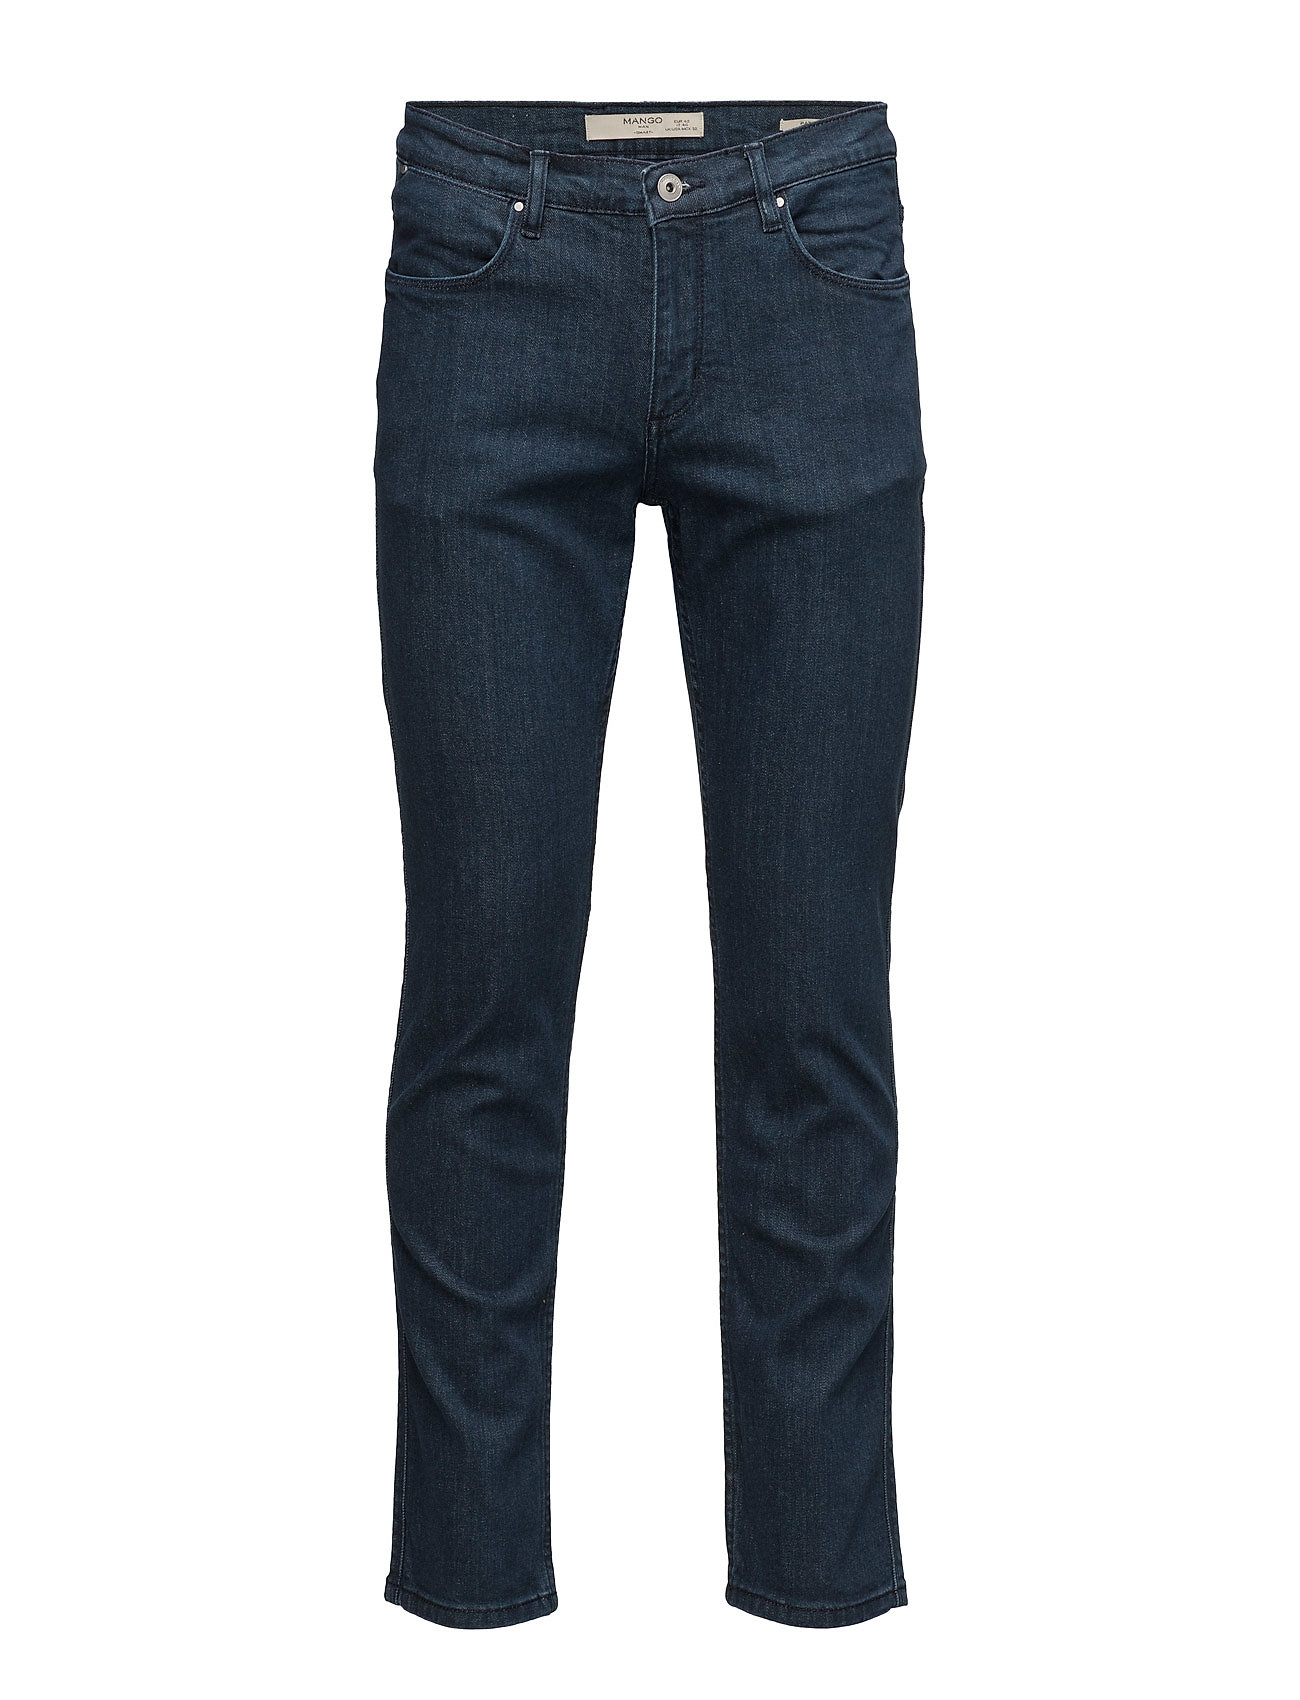 mango man Slim-fit dark wash patrick jeans på boozt.com dk